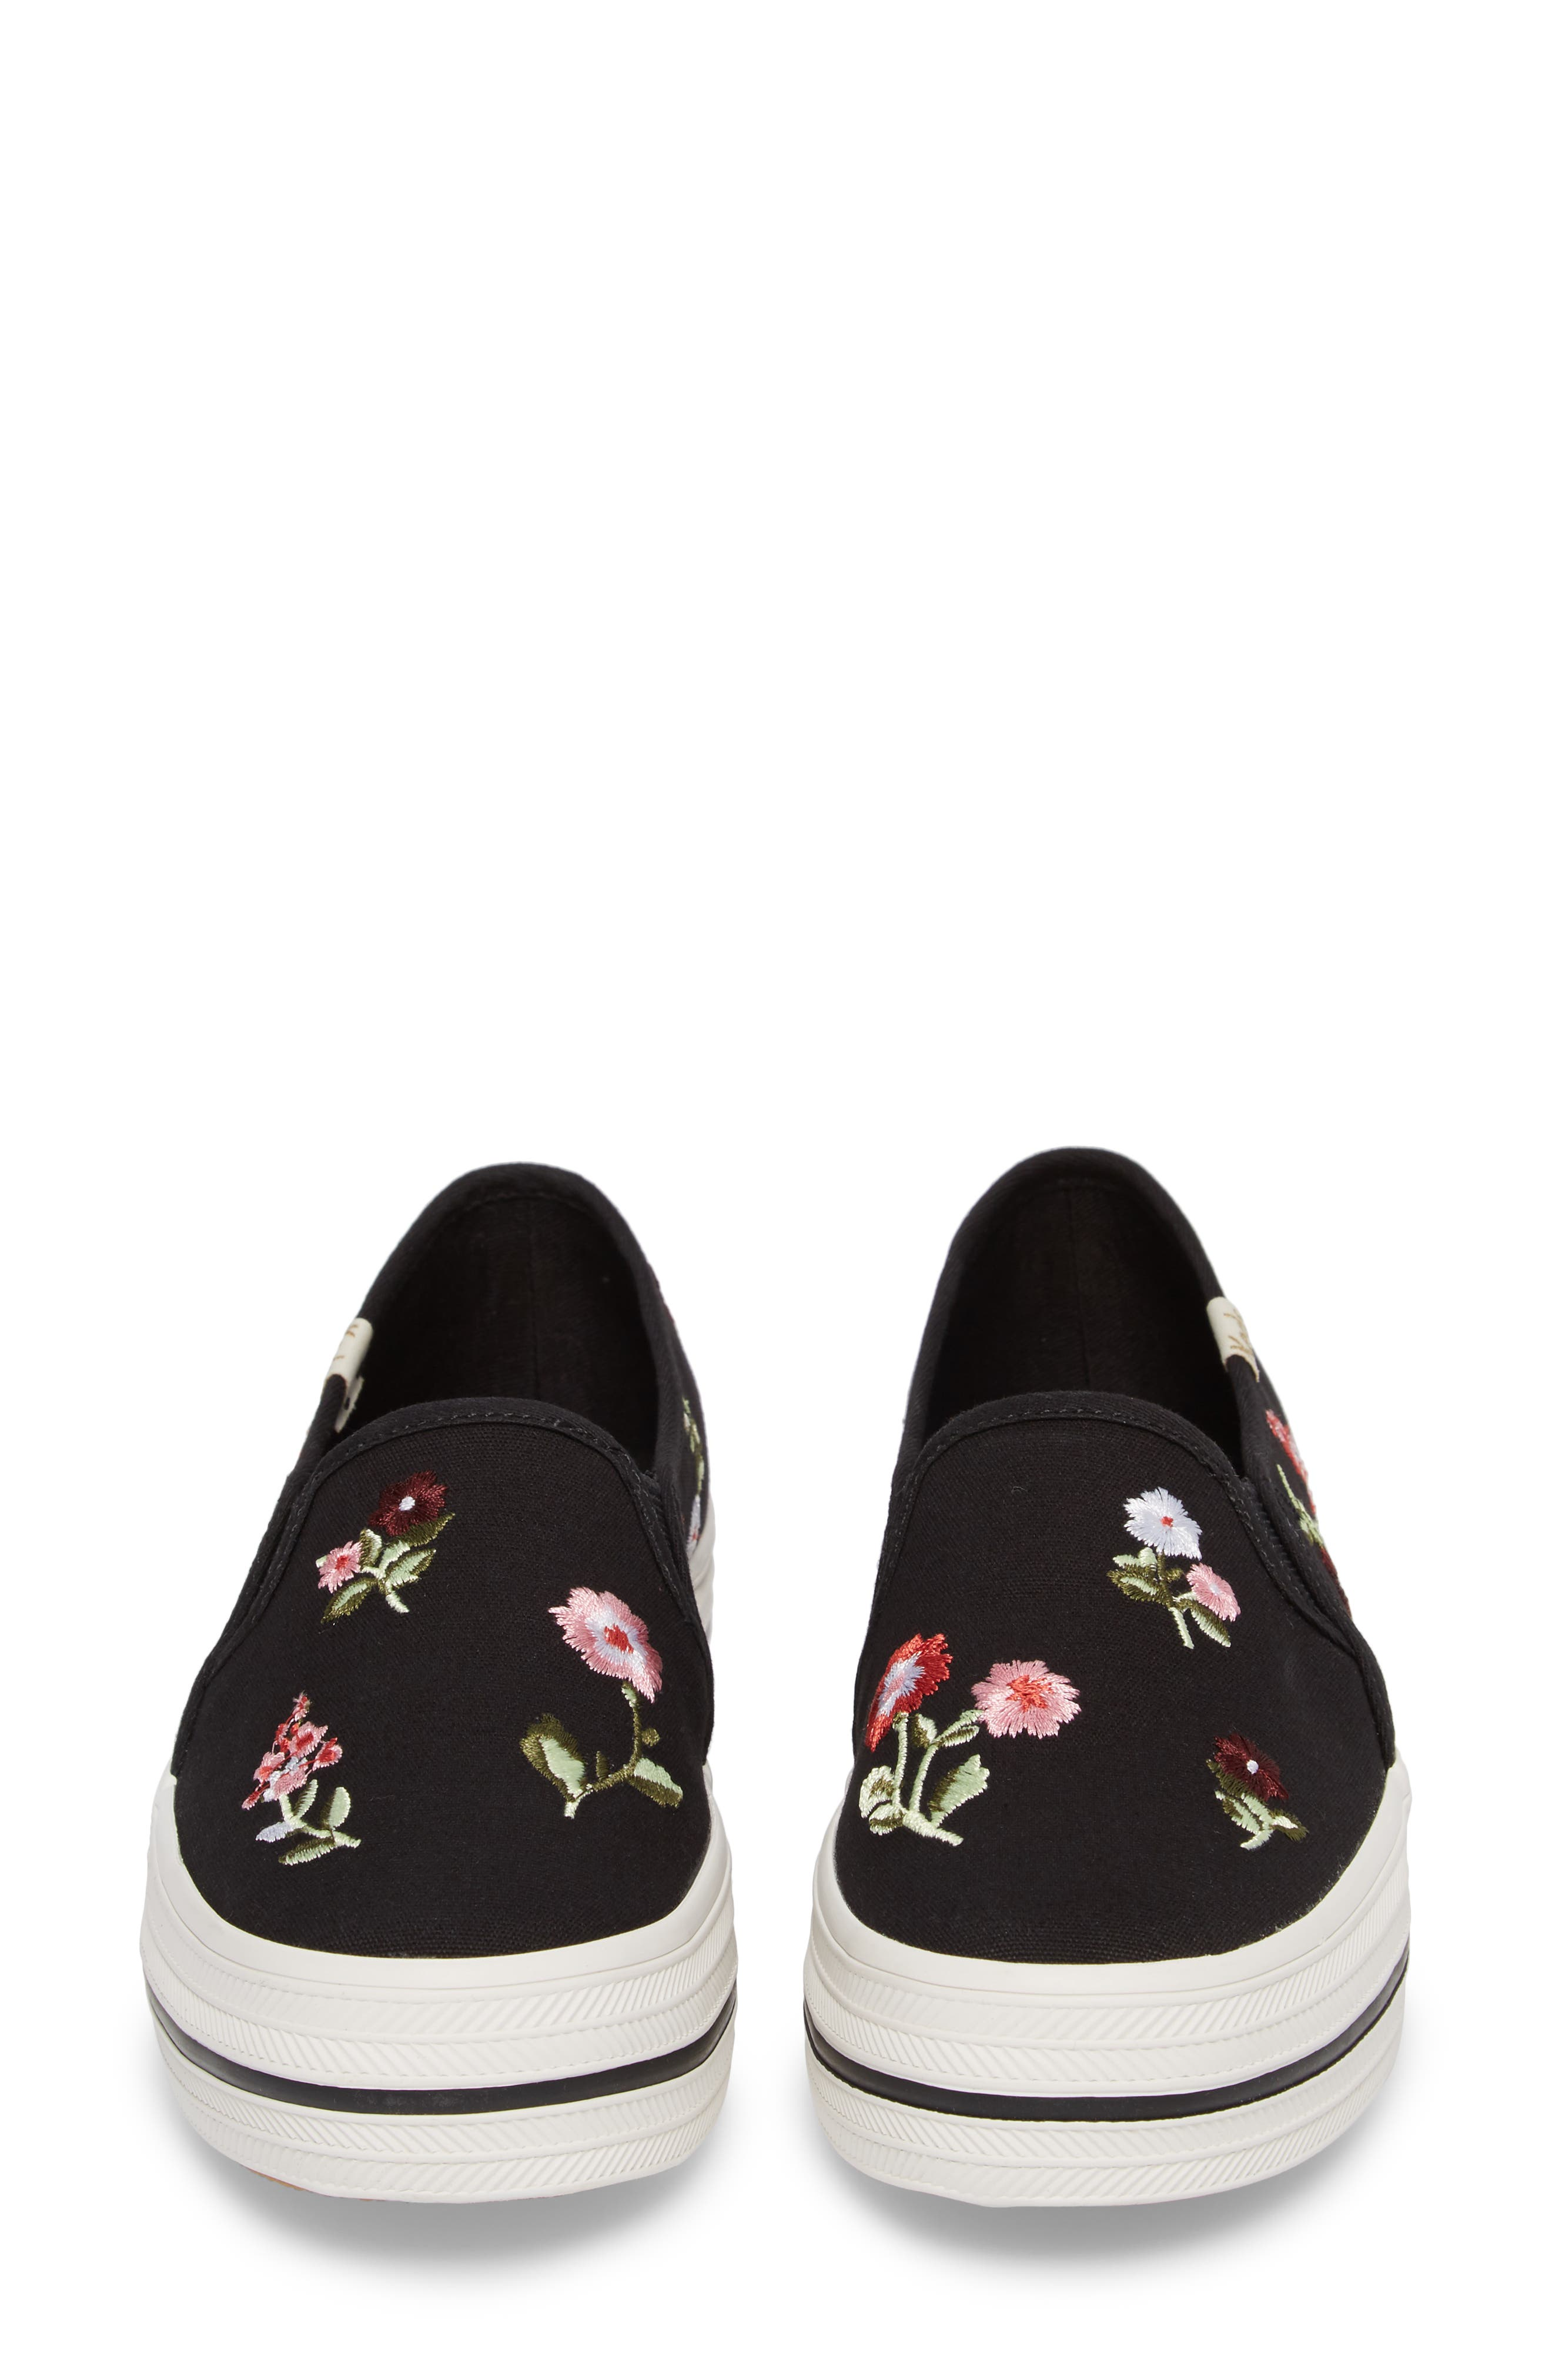 Keds<sup>®</sup> x kate spade Triple Decker Slip-On Sneaker,                             Alternate thumbnail 8, color,